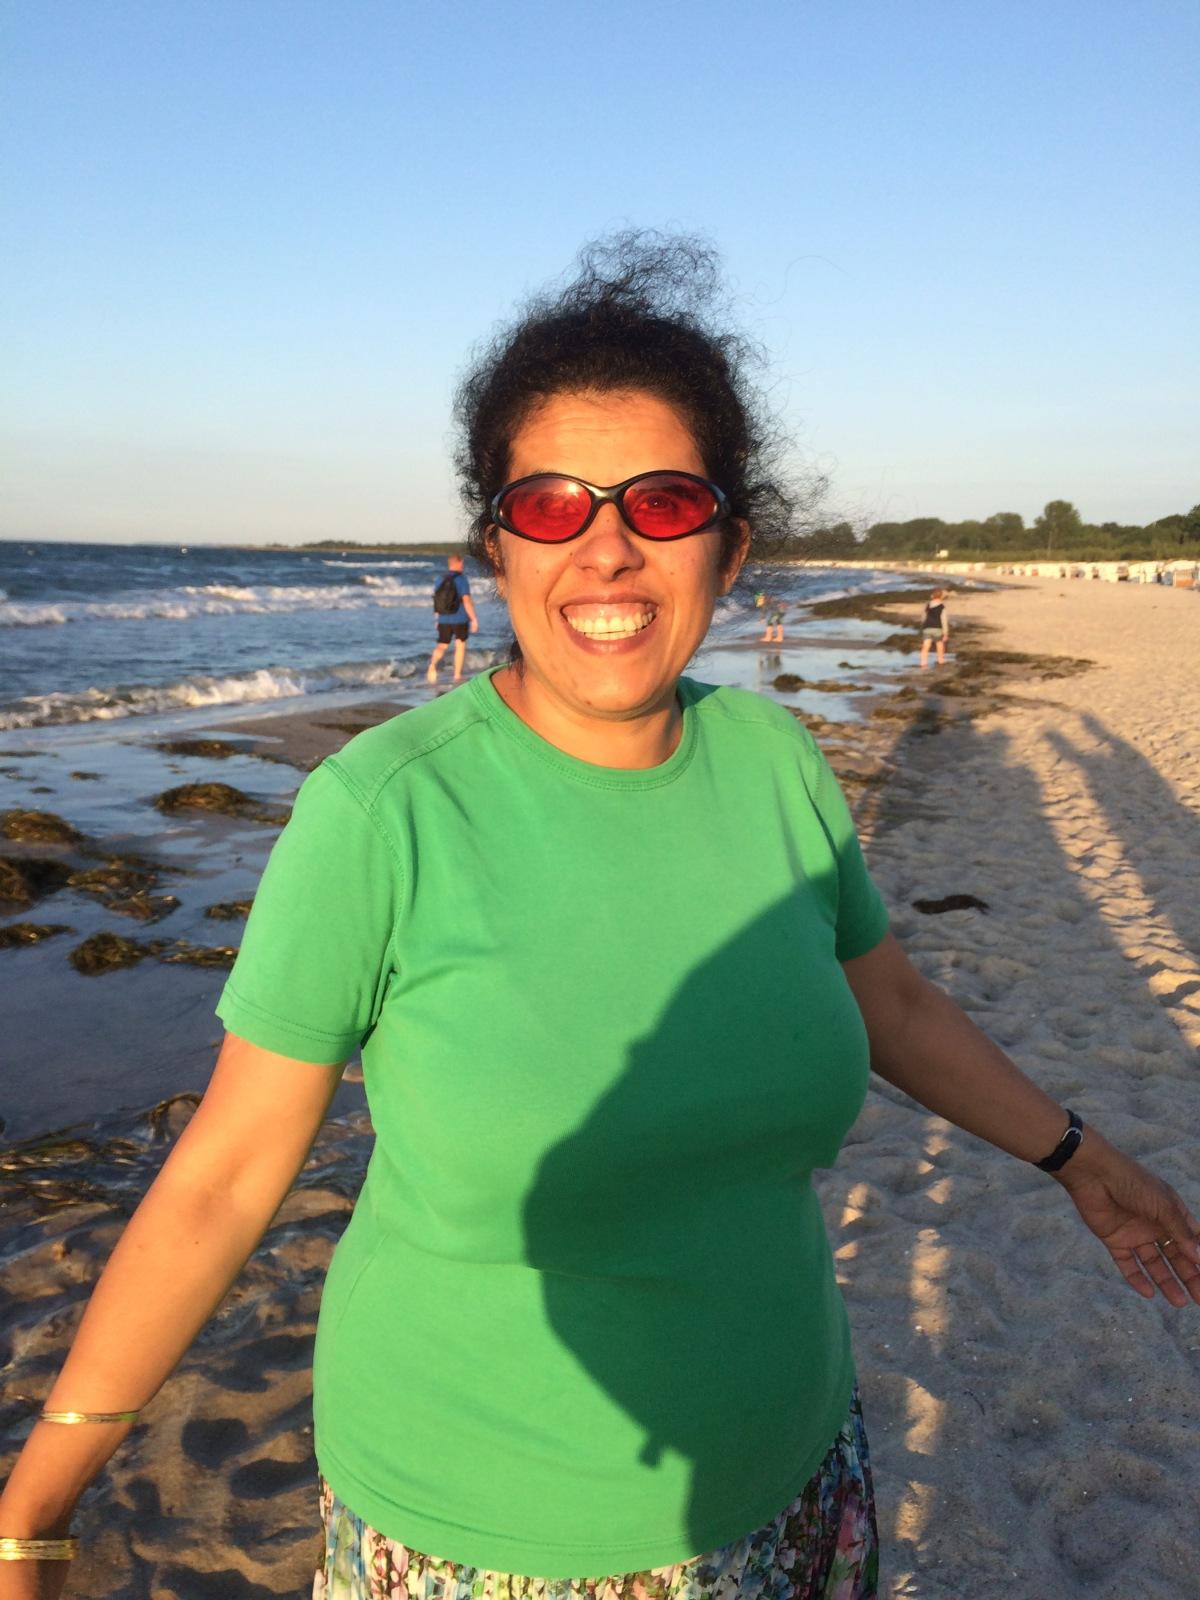 Lydia am Strand mit grünem T-Shirt und buntem Rock